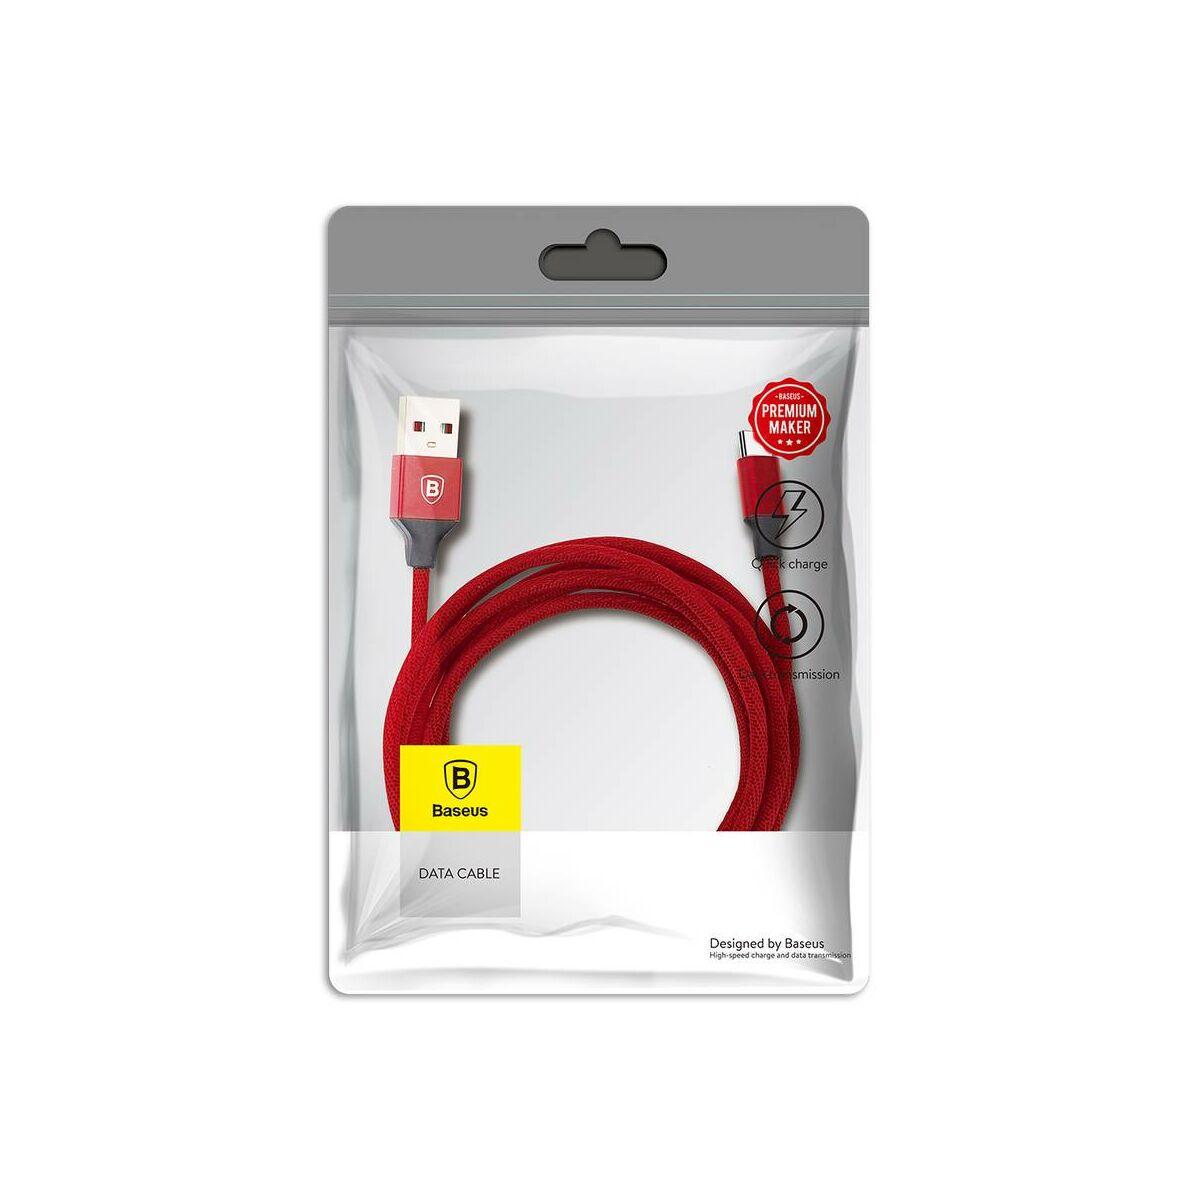 Baseus Type-C kábel, Yiven, 3A, 1.2m, piros (CATYW-09)